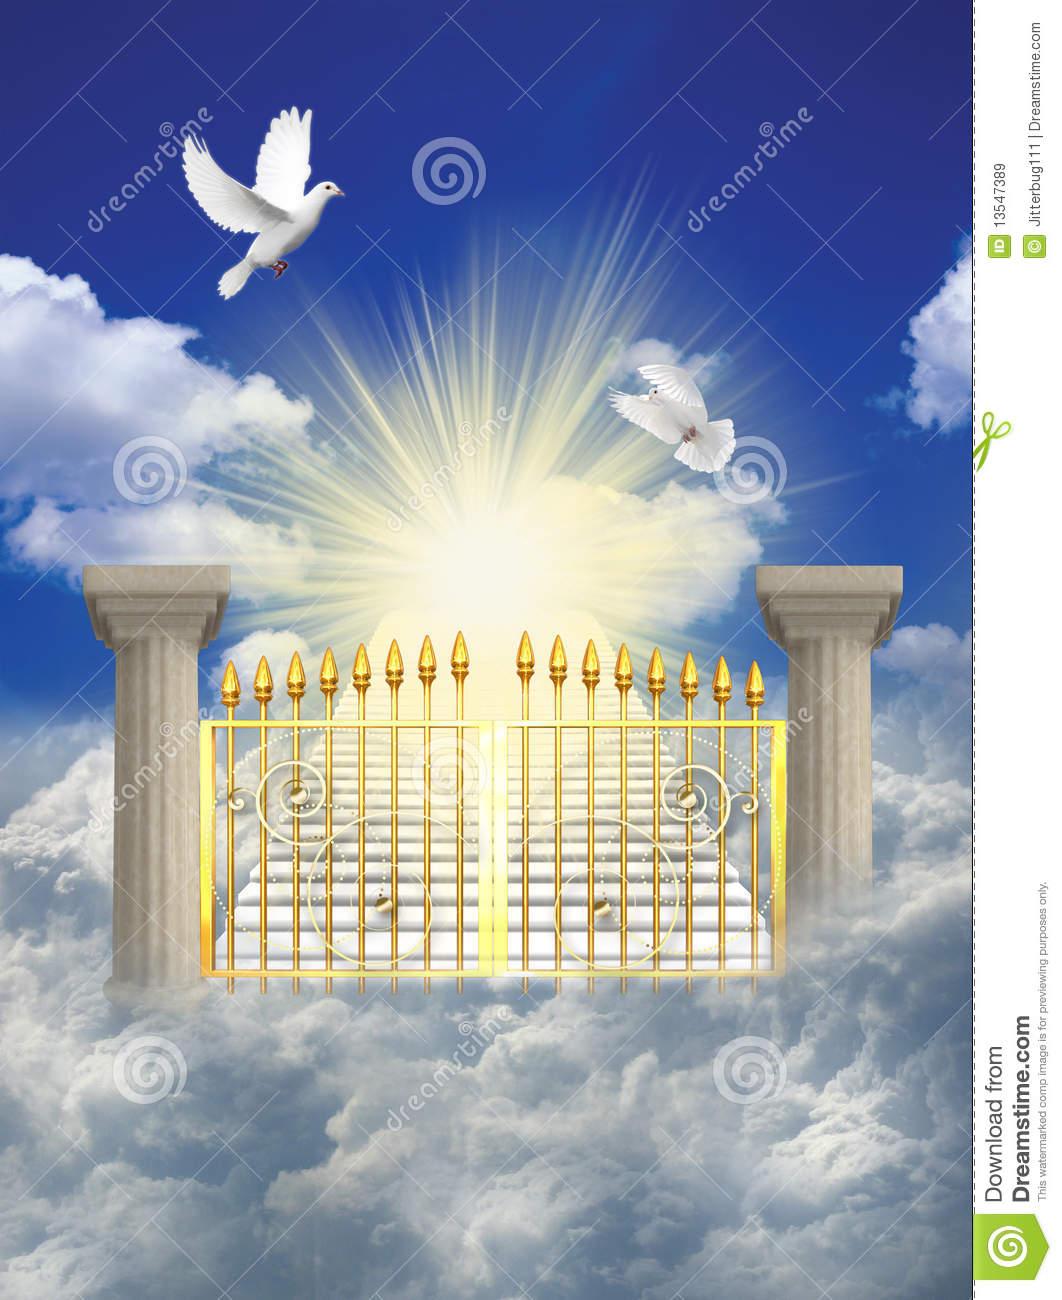 Clipart heaven picture download Heaven Clip Art Free | Clipart Panda - Free Clipart Images picture download